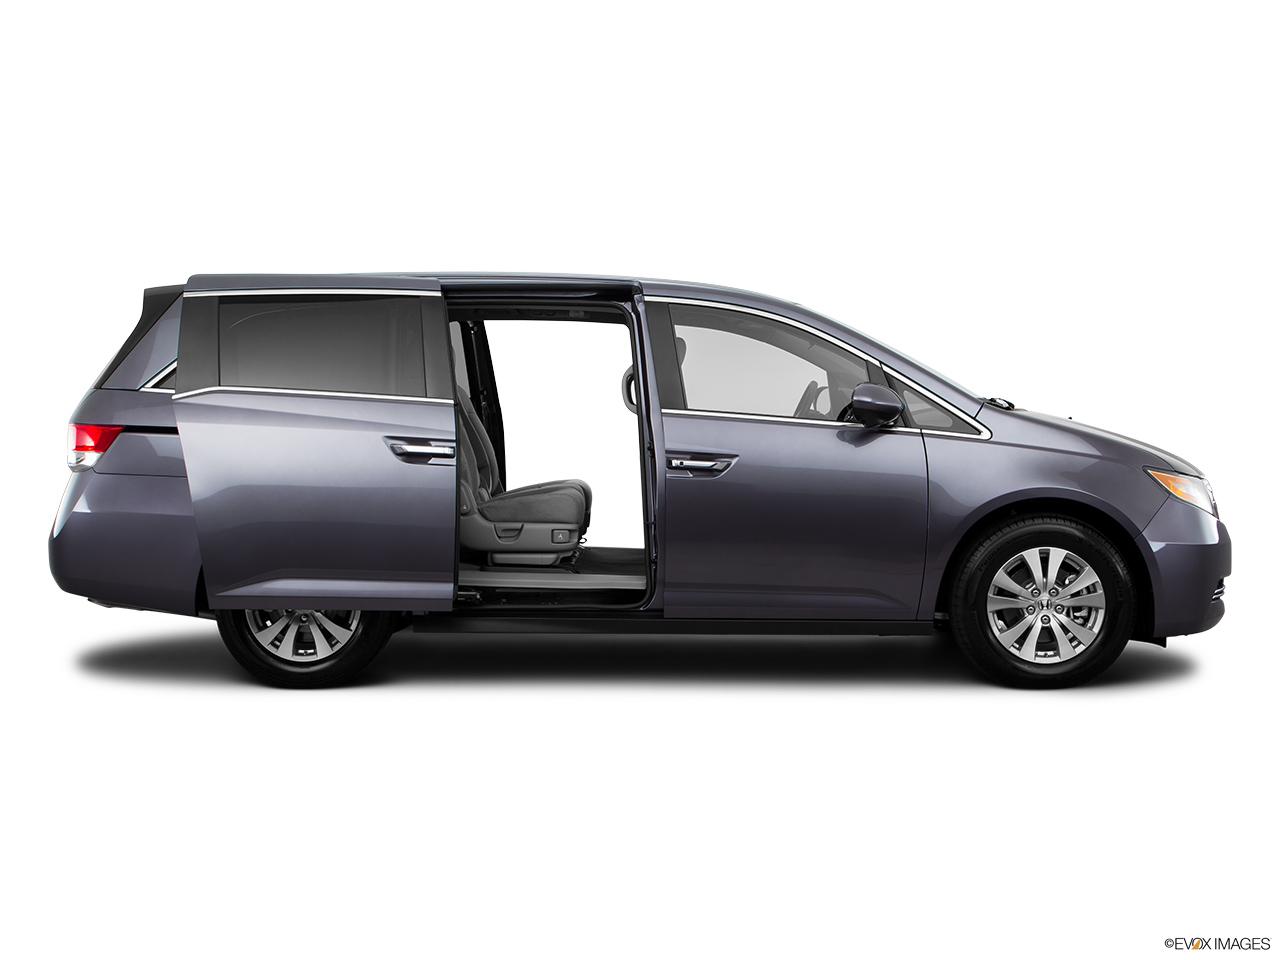 Honda odyssey new car price in malaysia 17